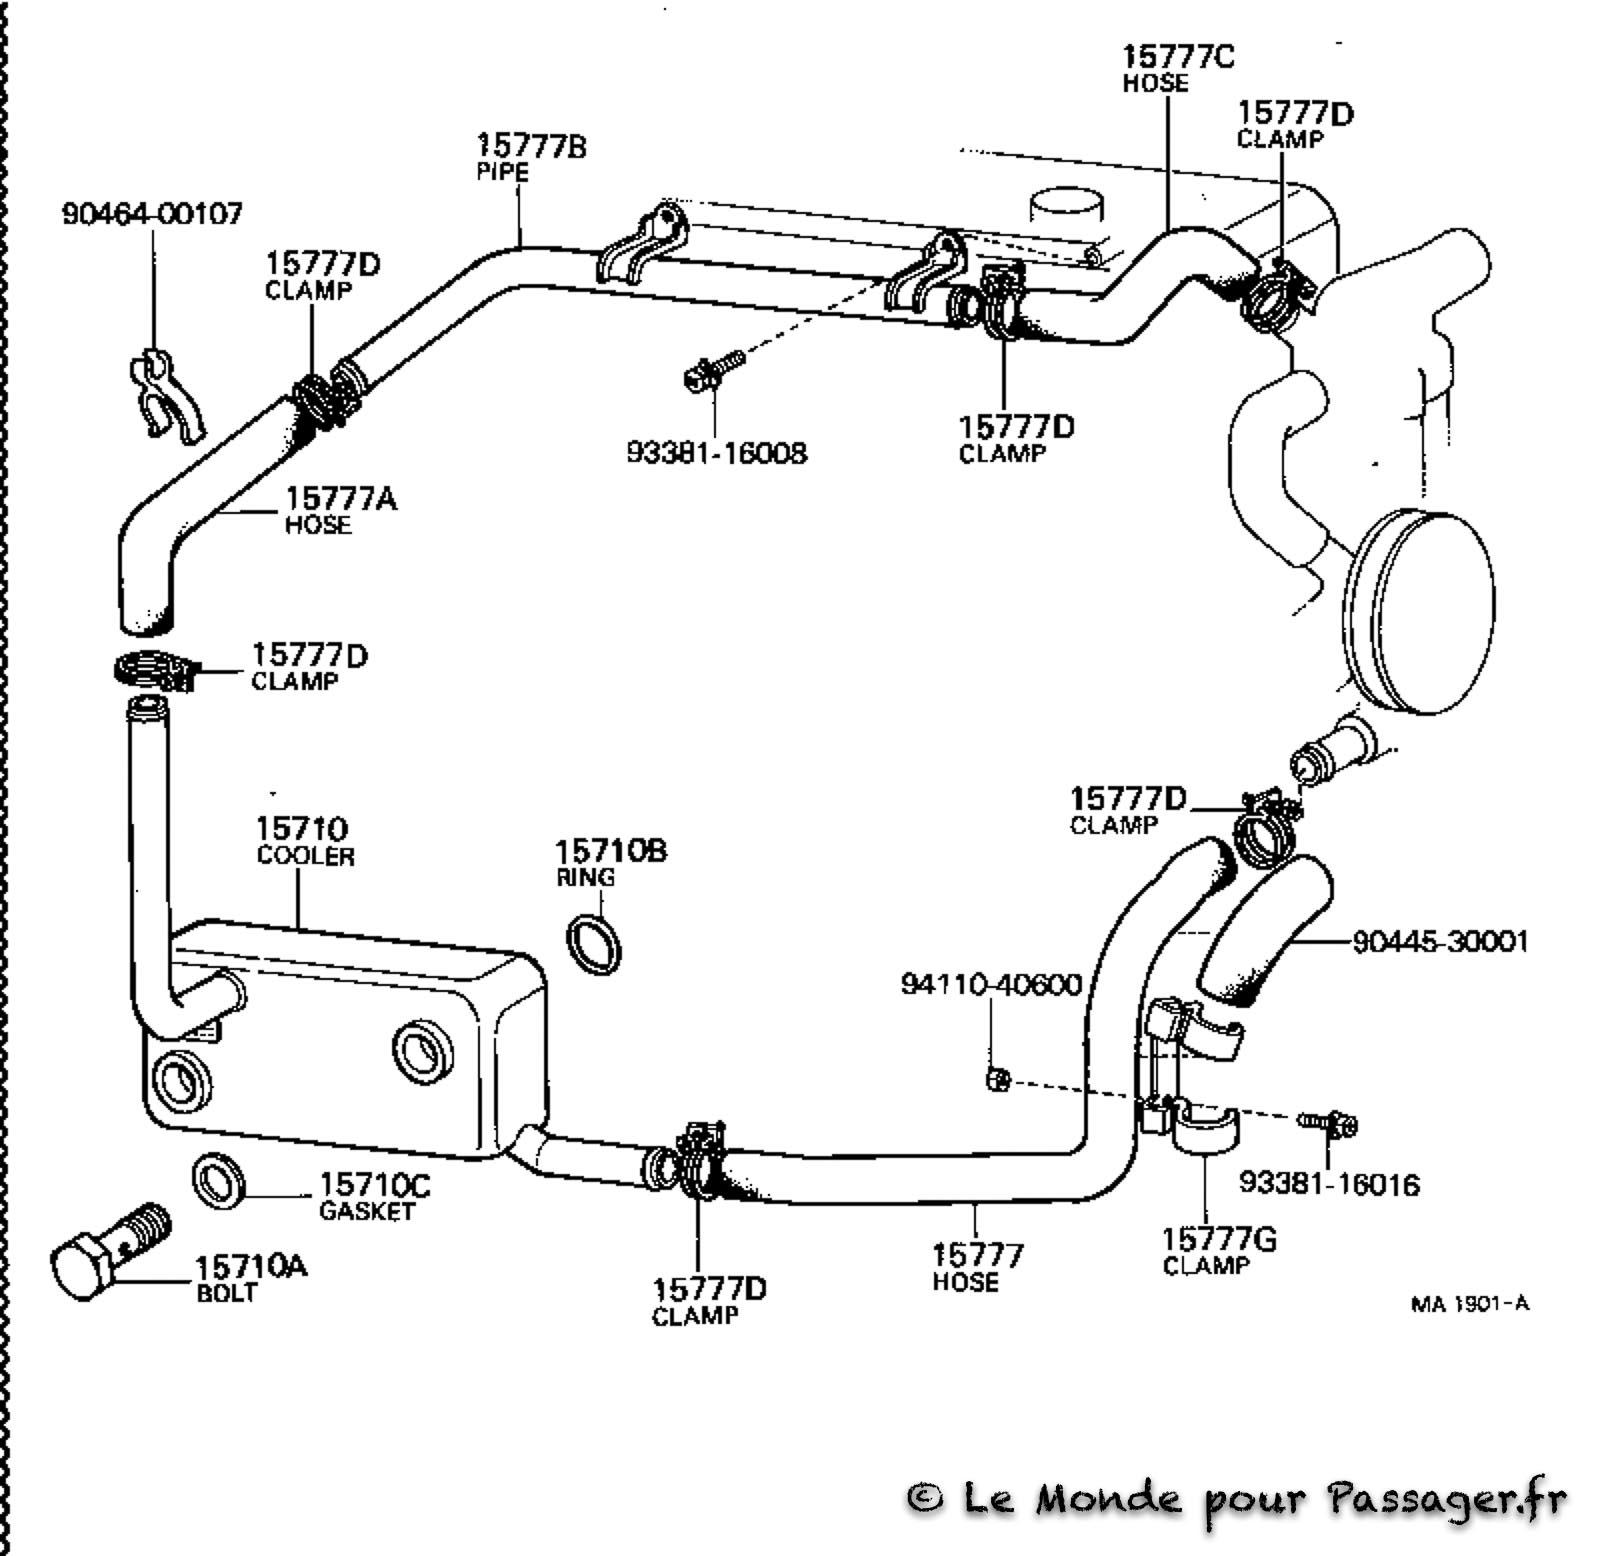 Fj55-Eclatés-Techniques011